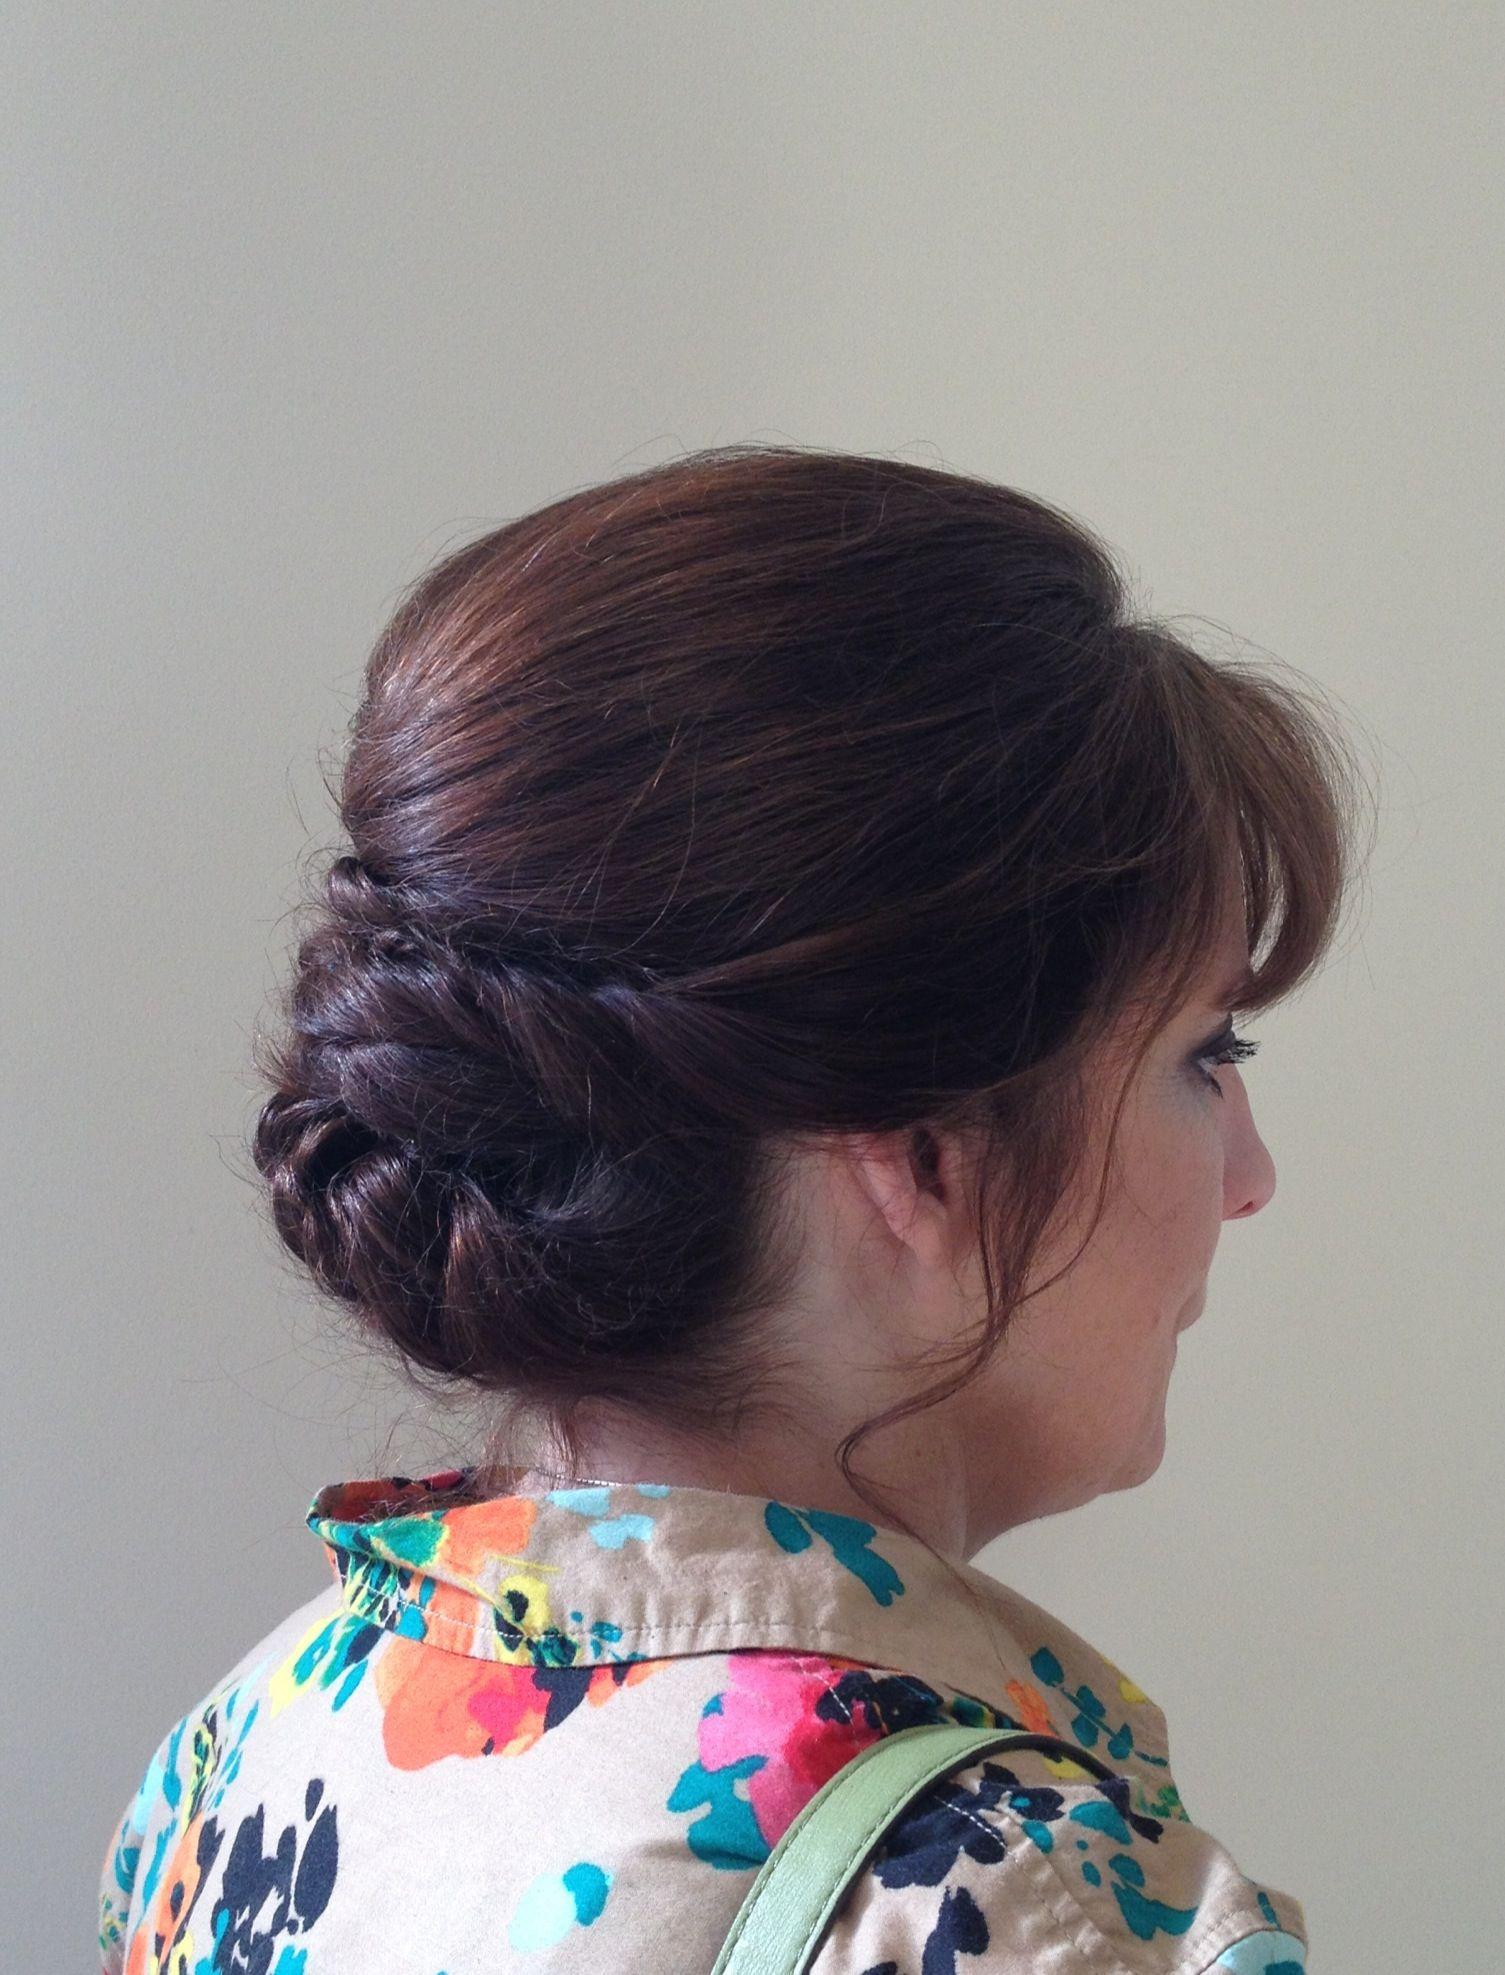 Sophisticated #updo #upstyle #wedding #bride #bridesmaid #maidofhonor #prom #lexievhair